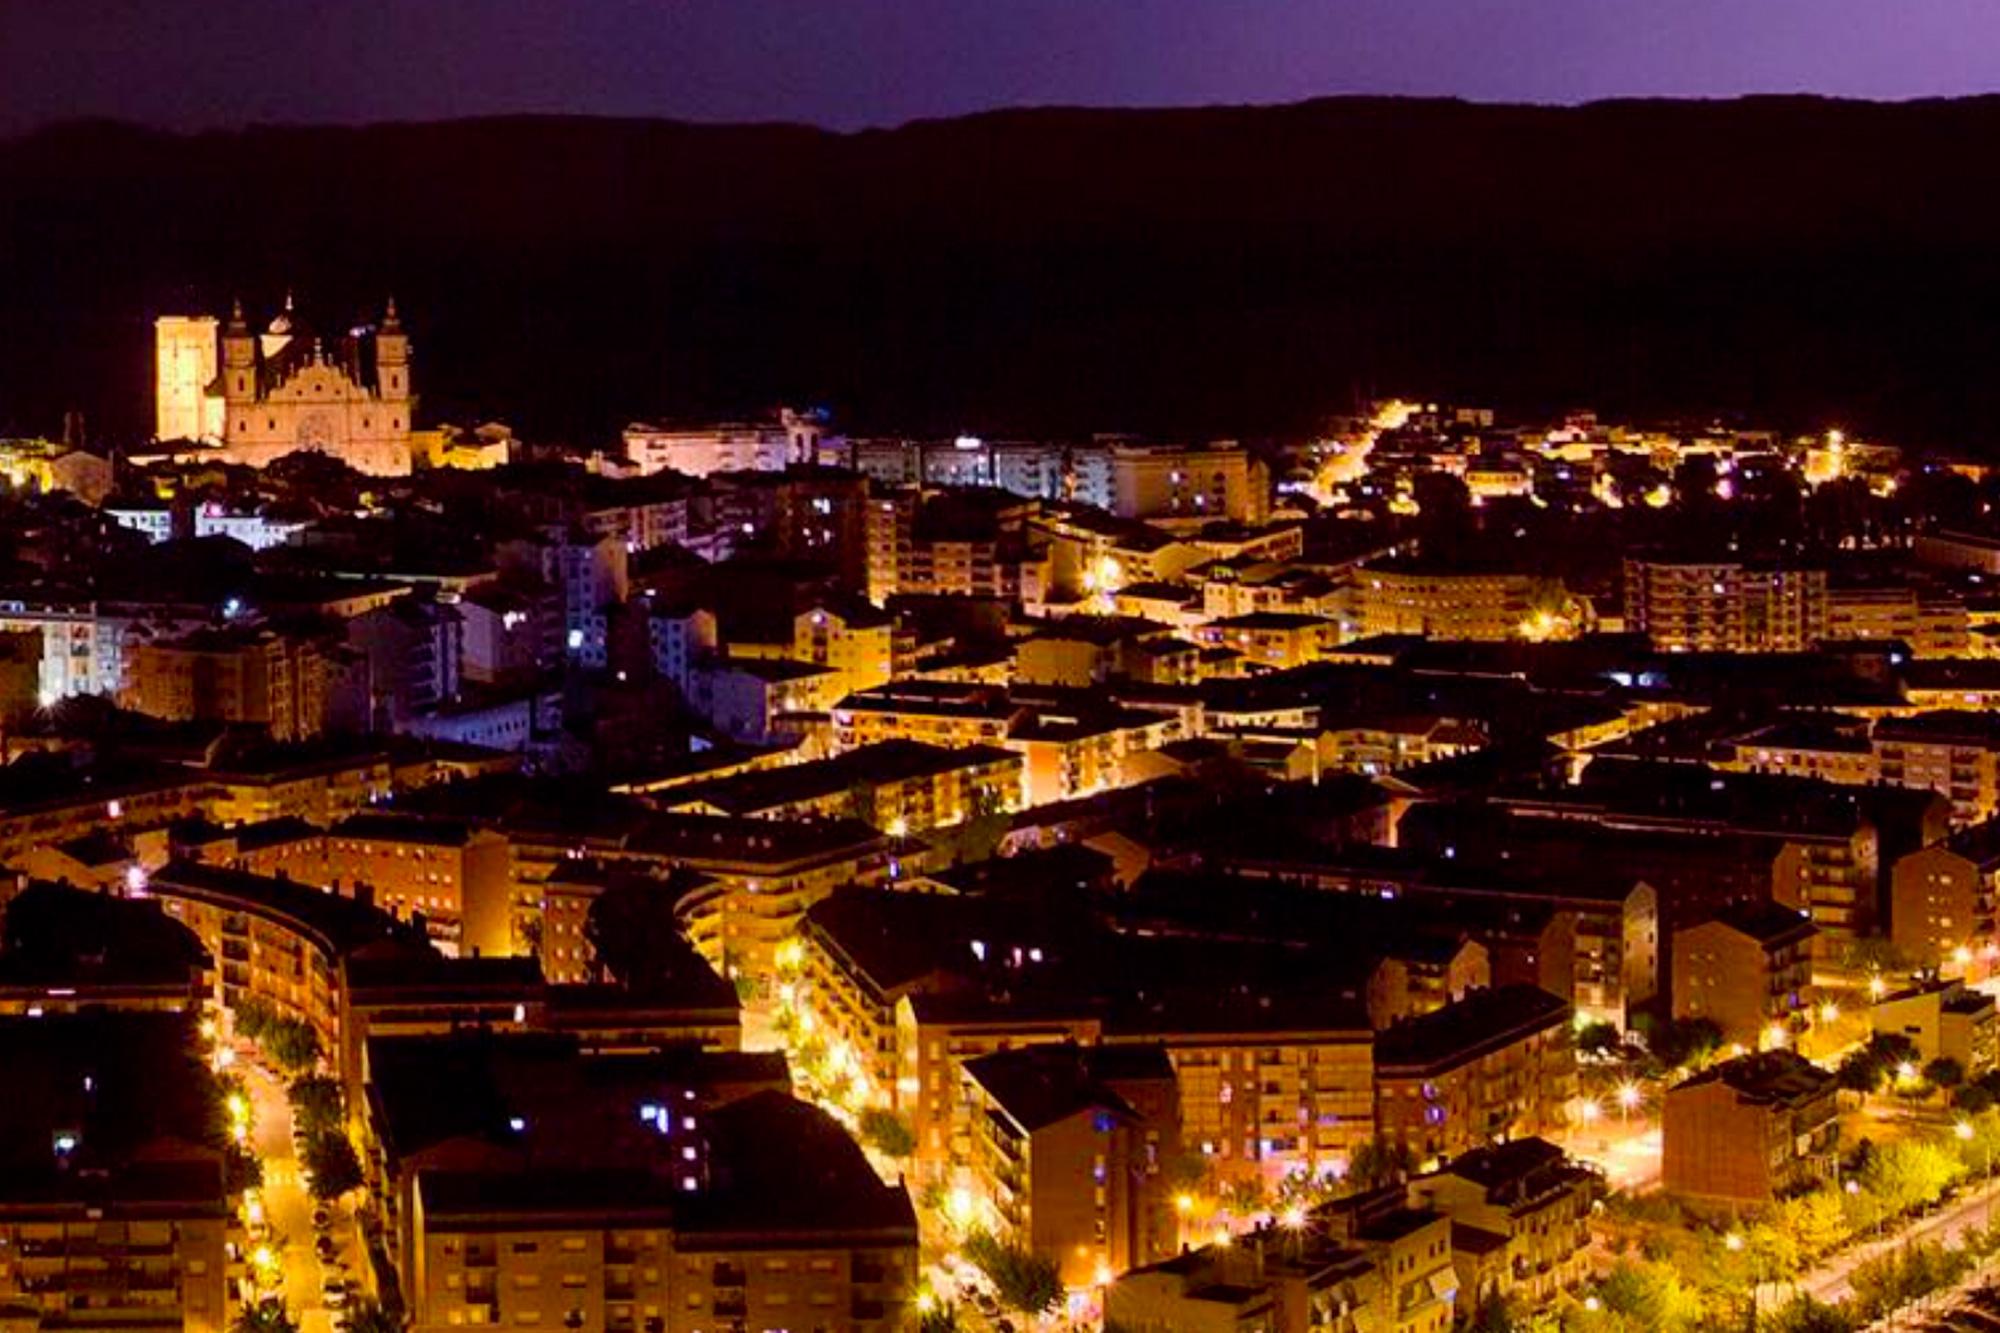 Alcaniz en el Bajo Aragón // © Jordi Ferrer Ber